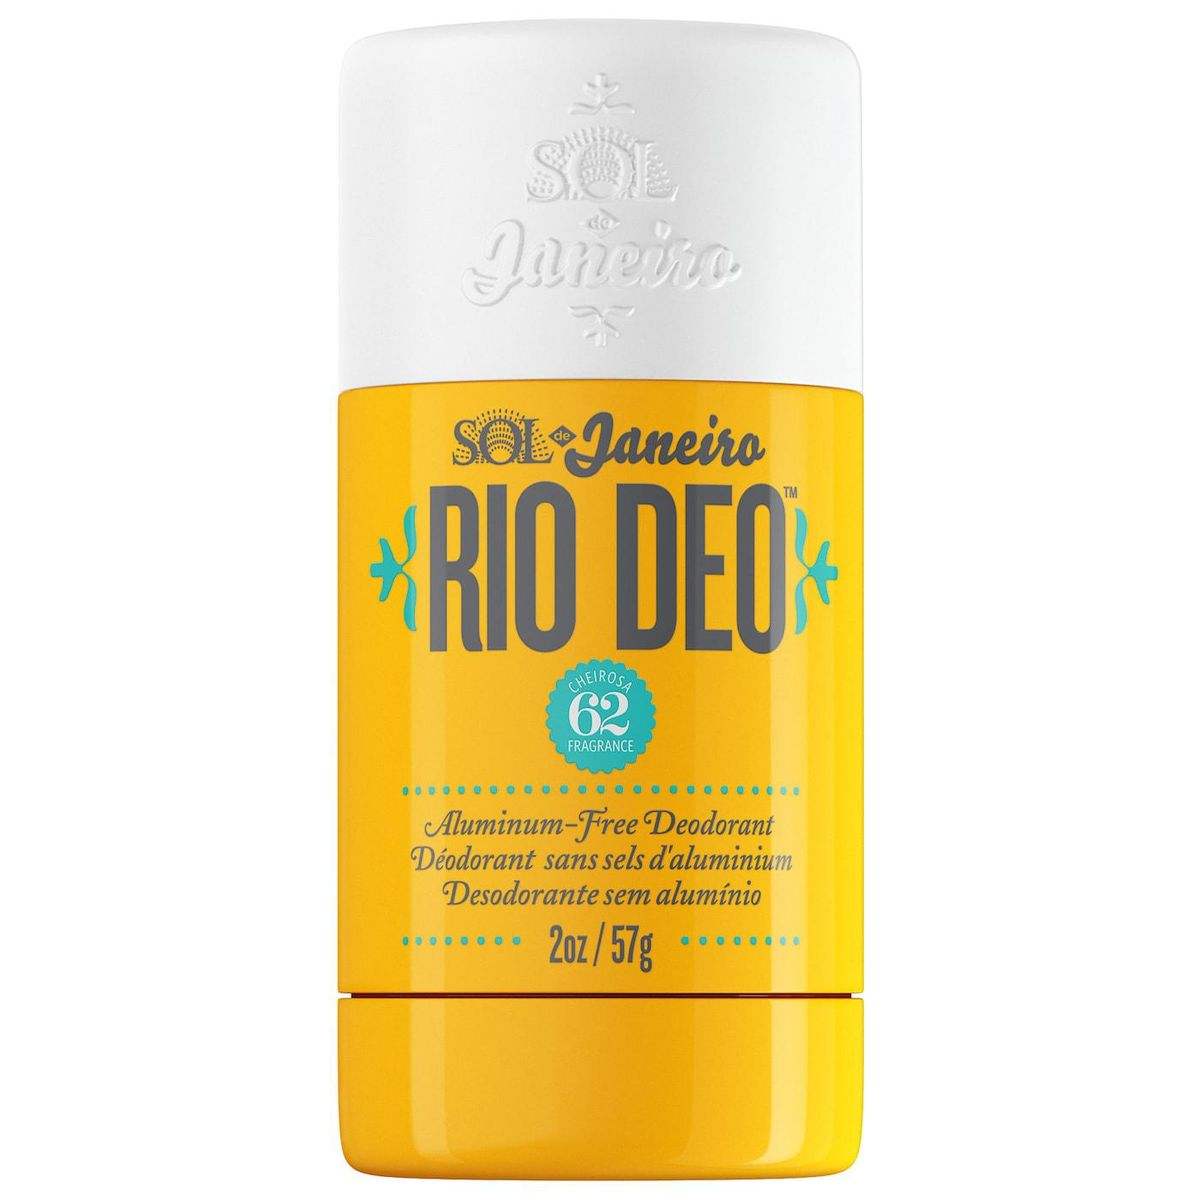 sol de janeiro rio deo aluminum free deodorant